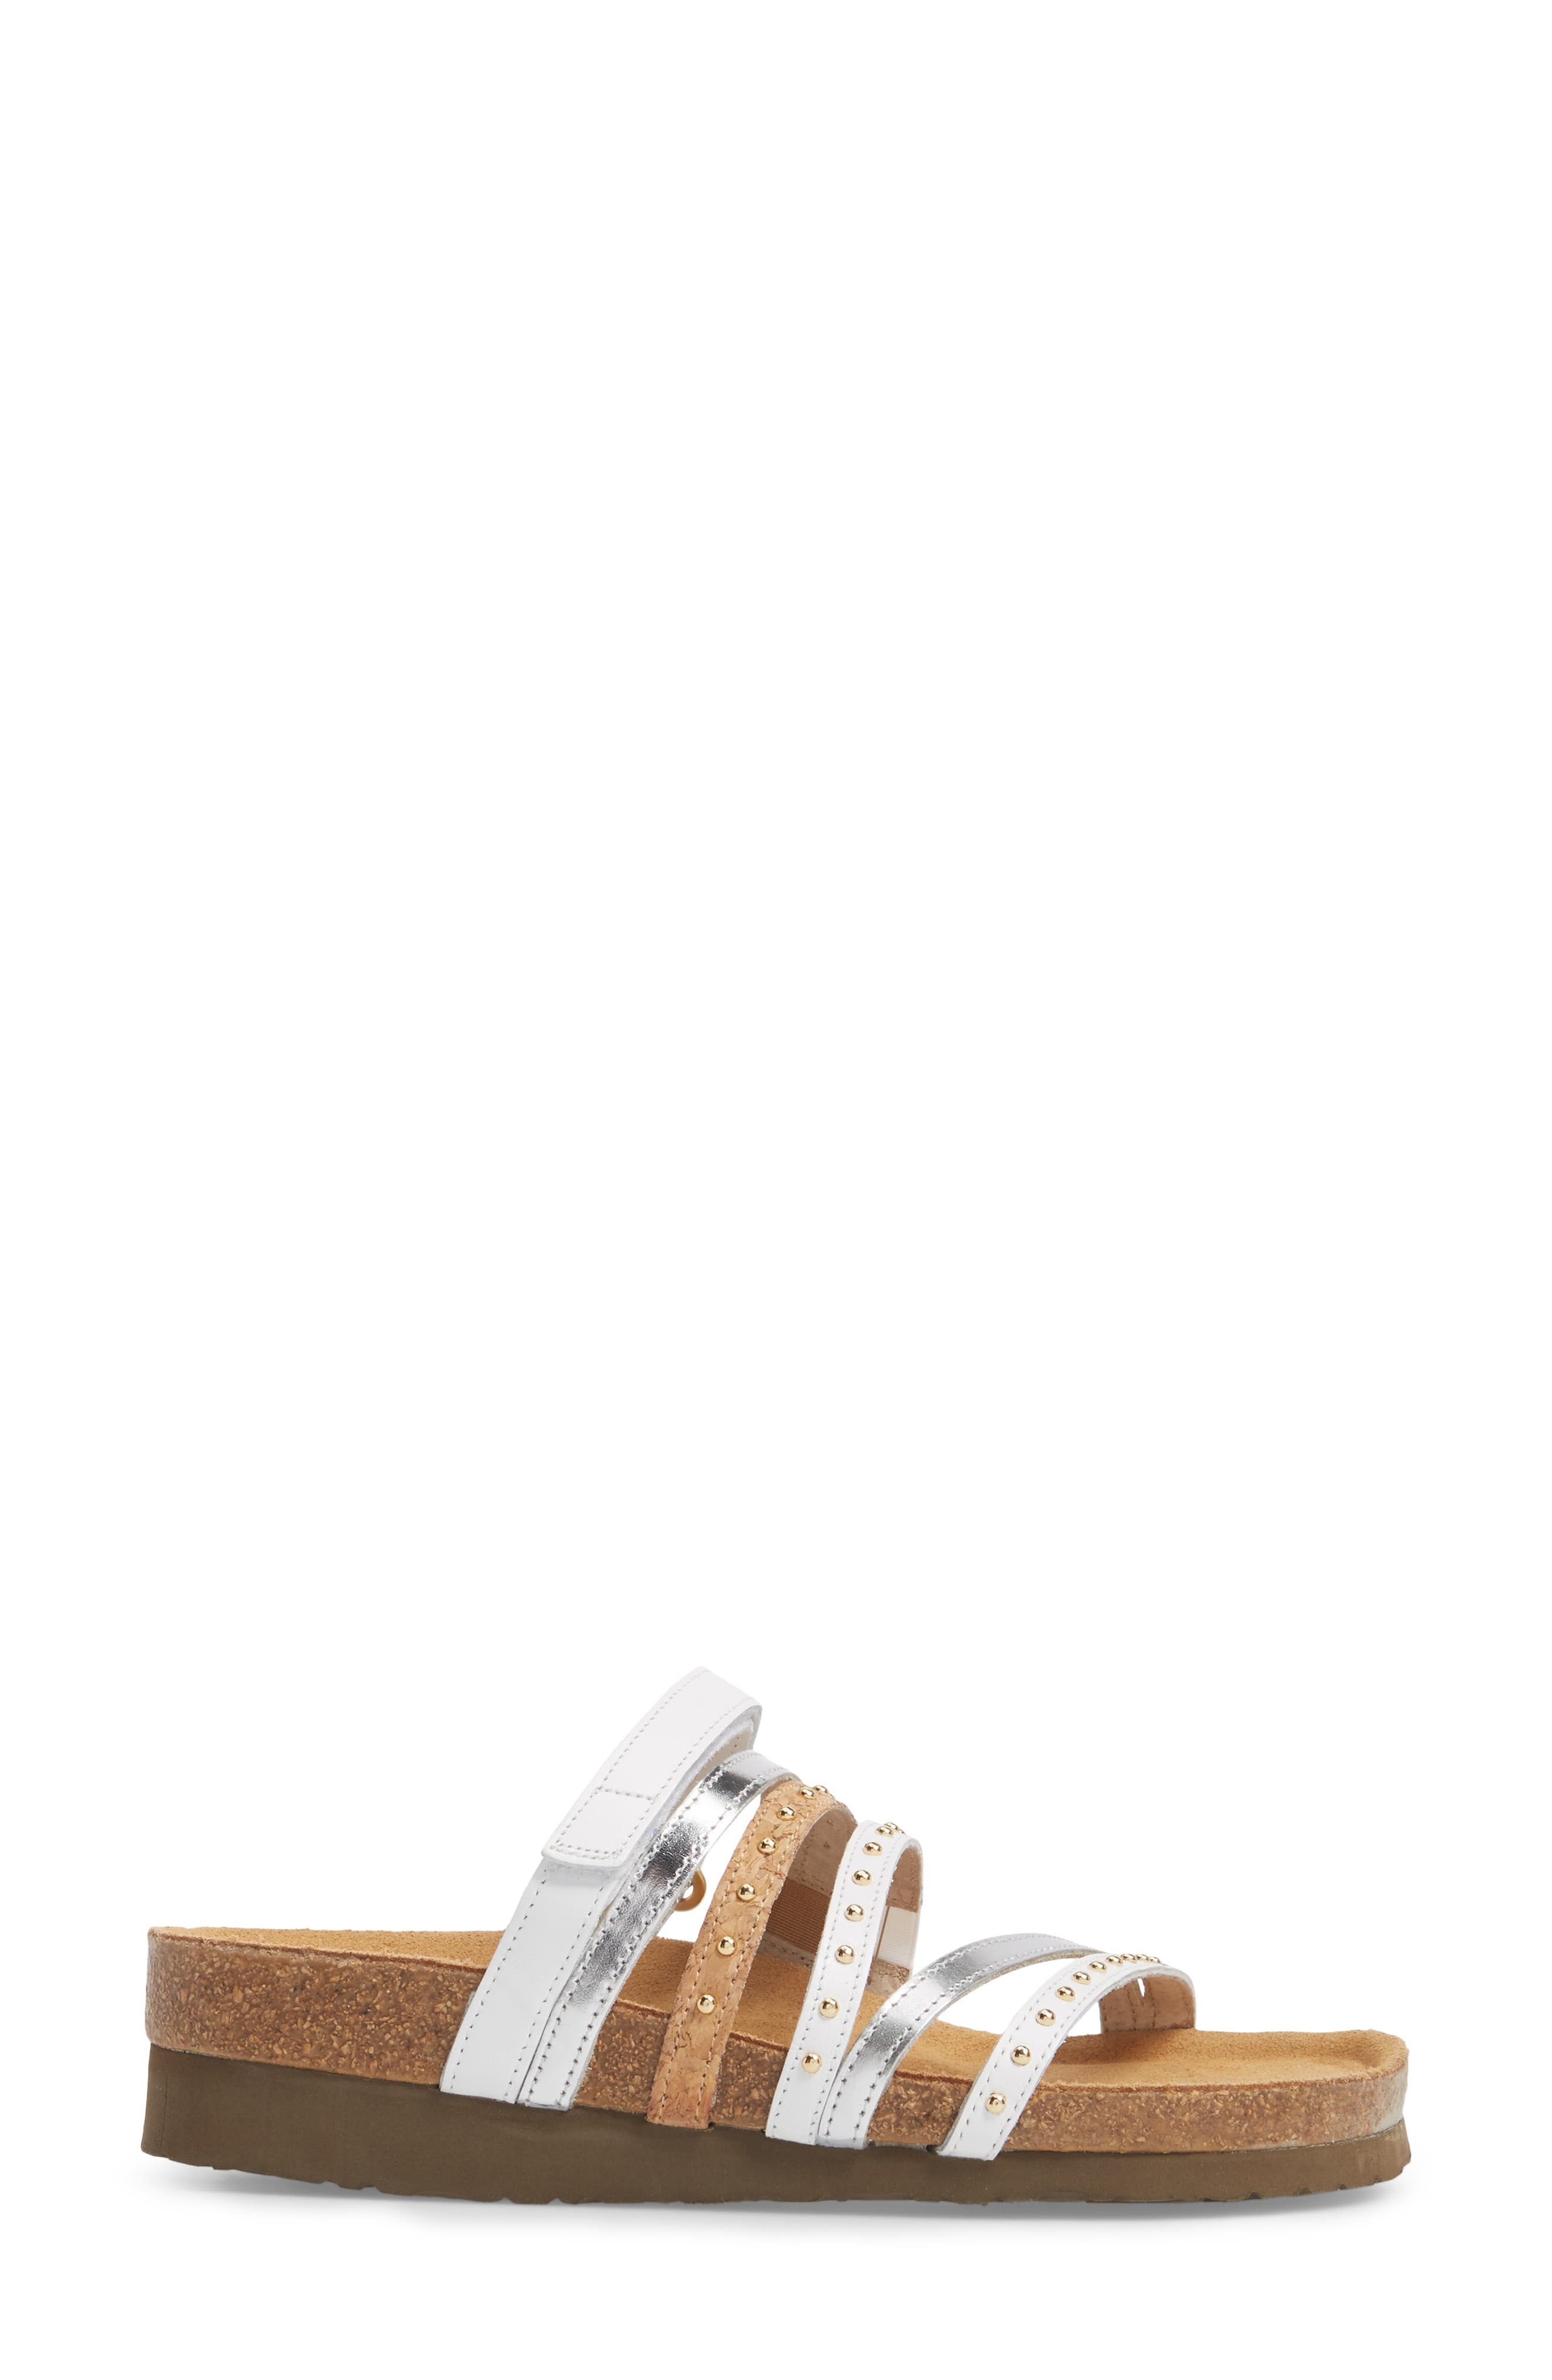 Prescott Sandal,                             Alternate thumbnail 3, color,                             WHITE/ SILVER LEATHER